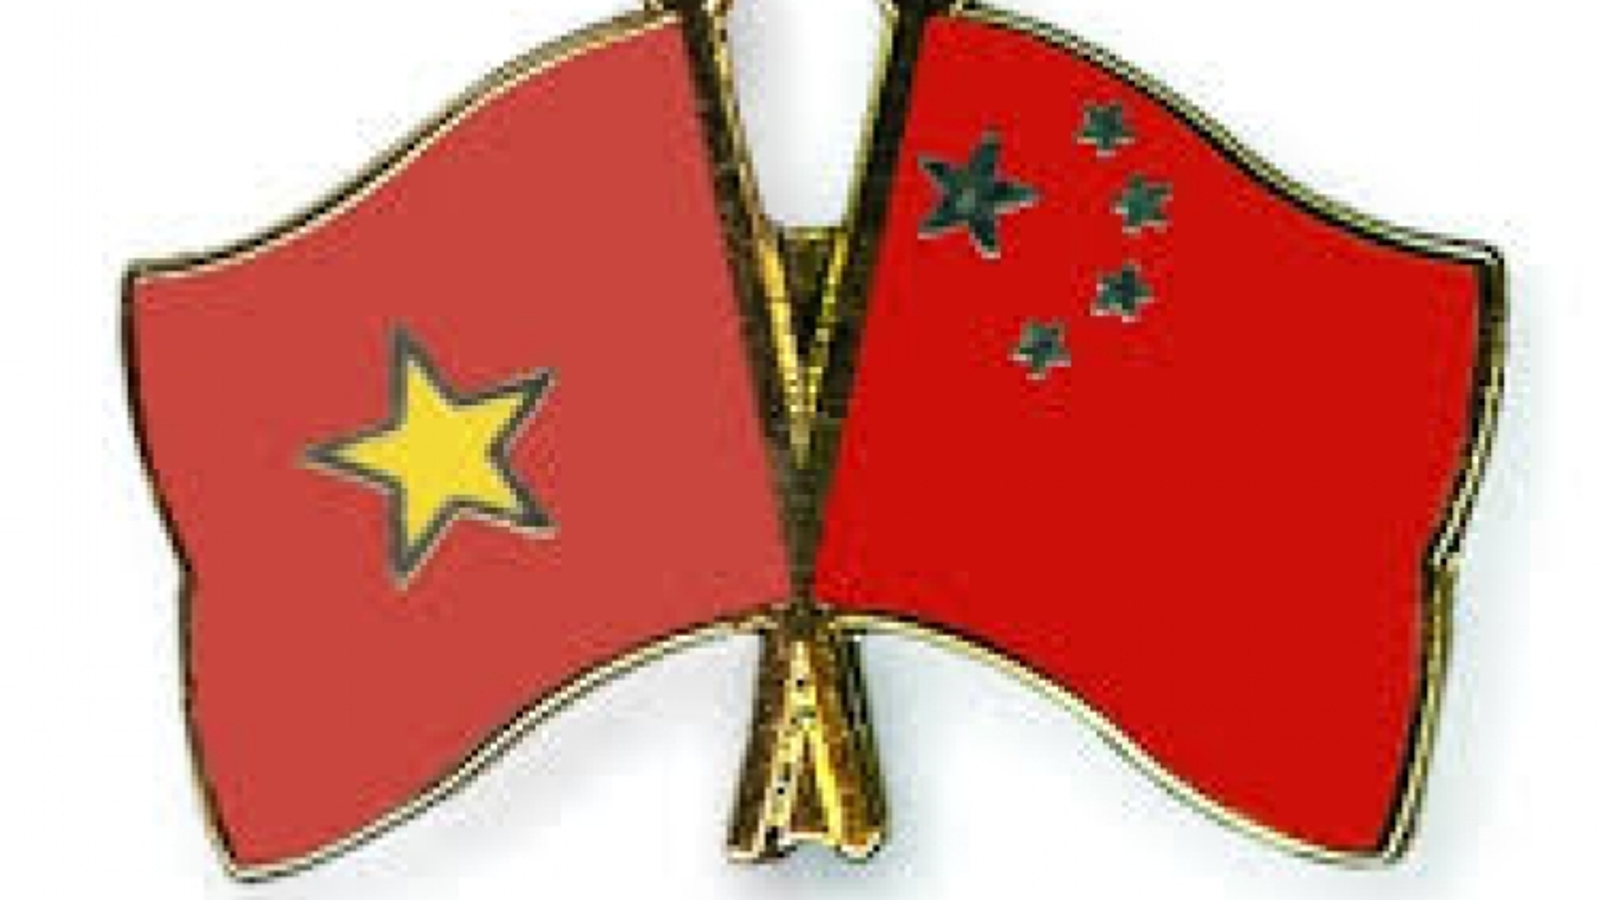 Leaders congratulate on Vietnam-China diplomatic ties